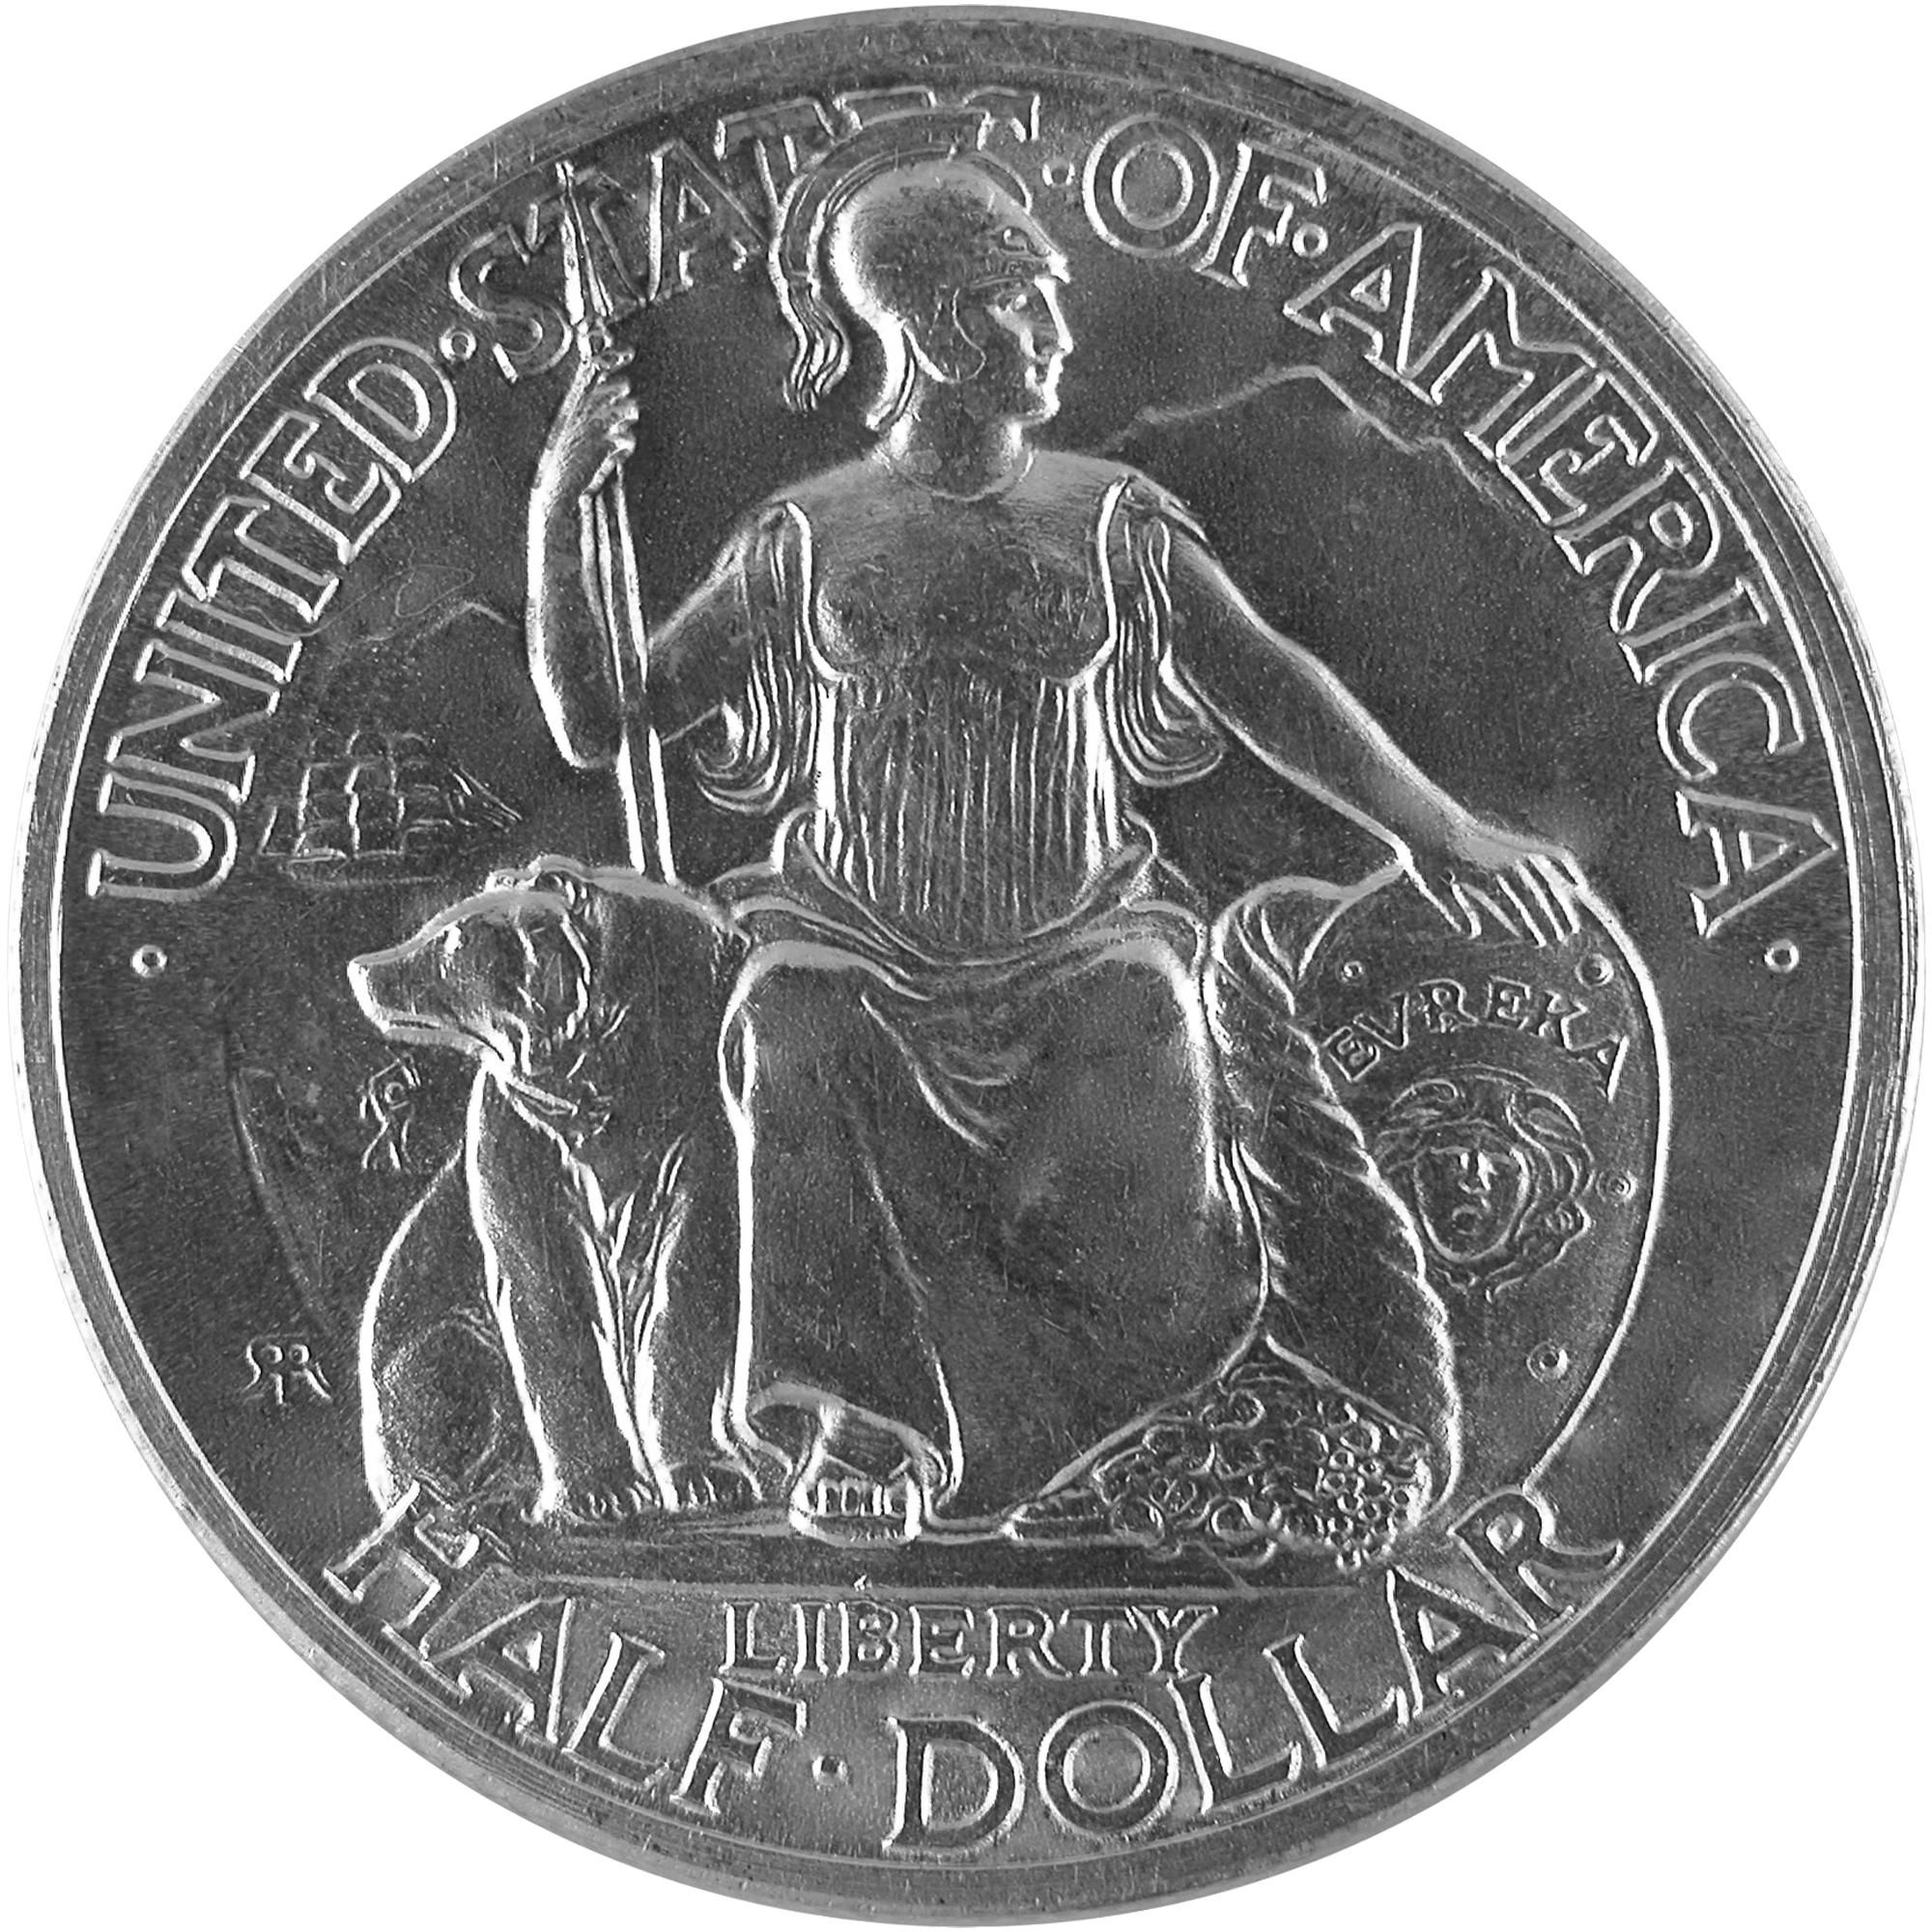 1935 San Diego California Pacific Exposition Commemorative Silver Half Dollar Coin Obverse